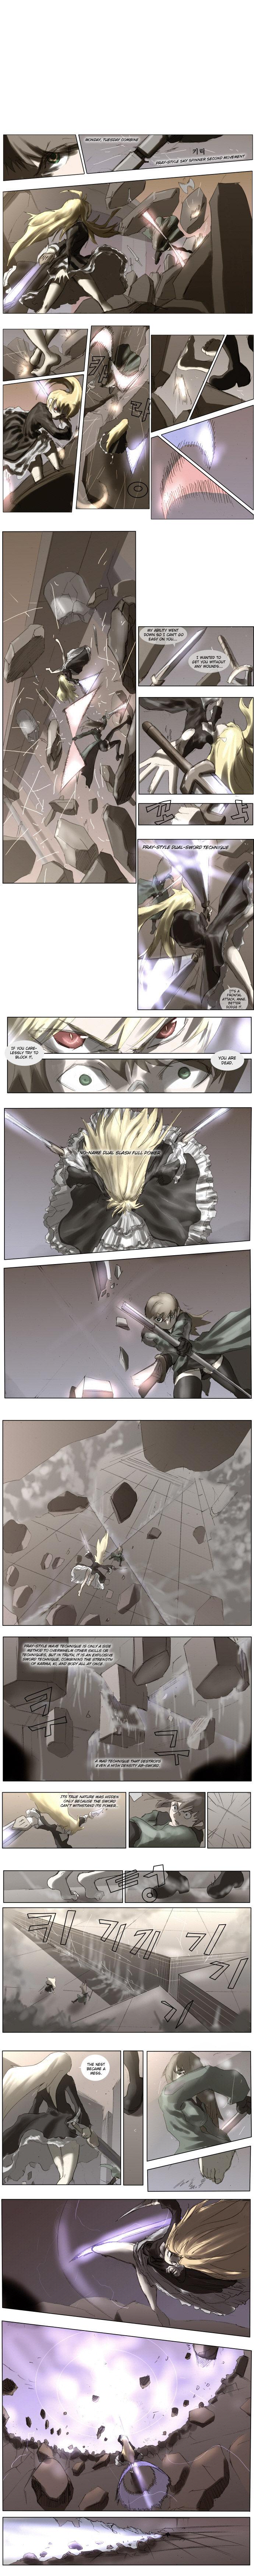 Knight Run 66 Page 2